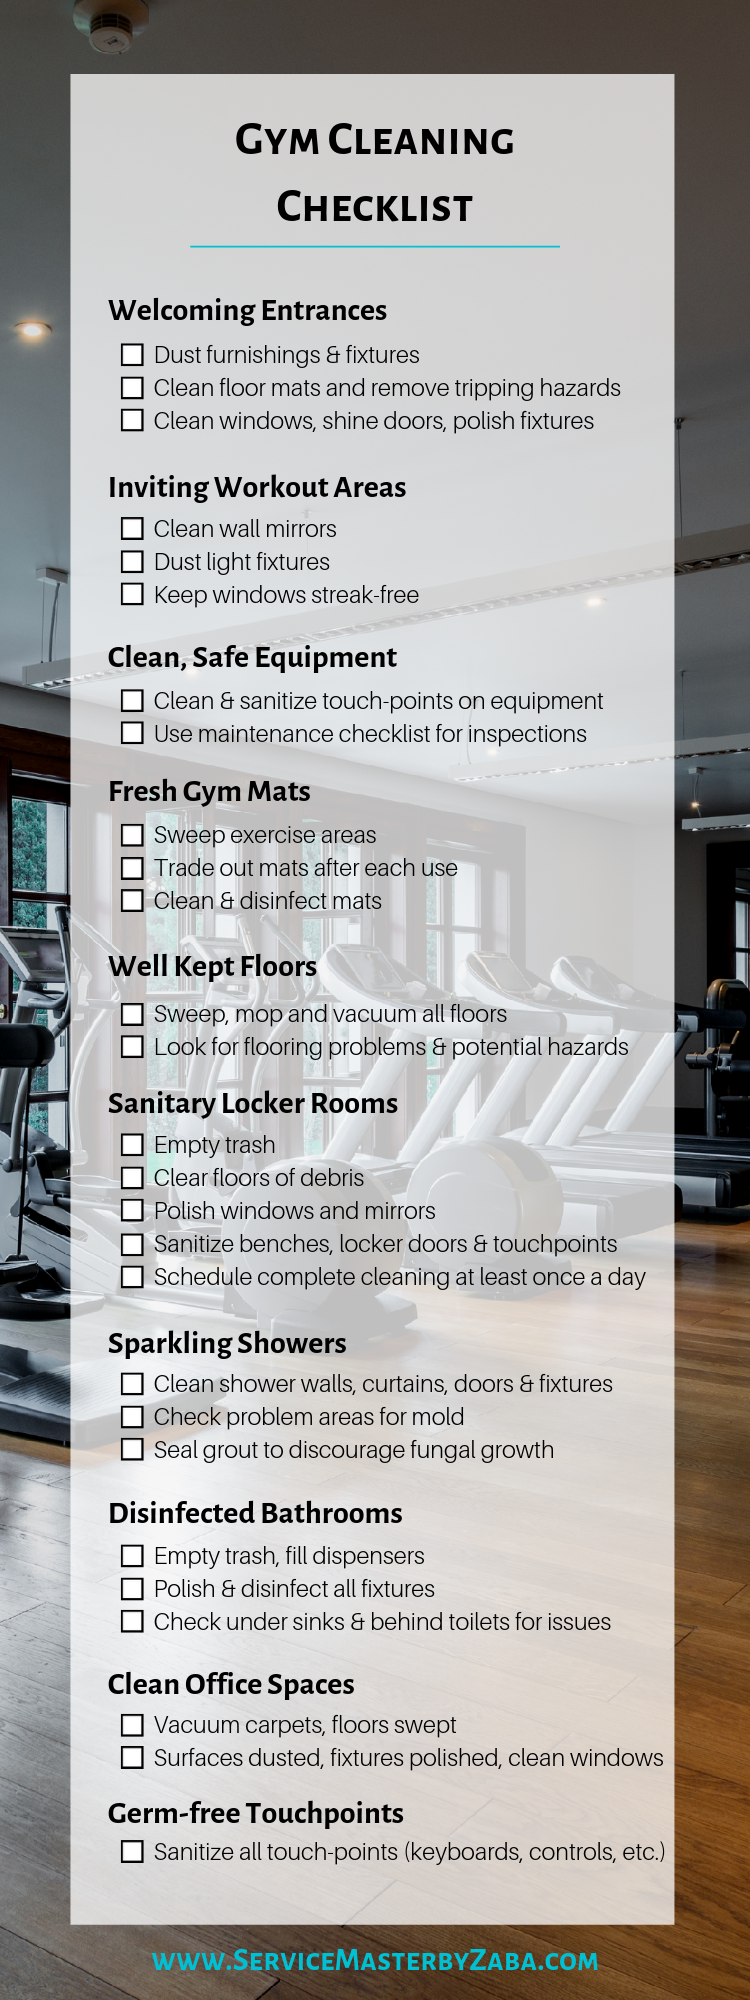 gym cleaning checklist